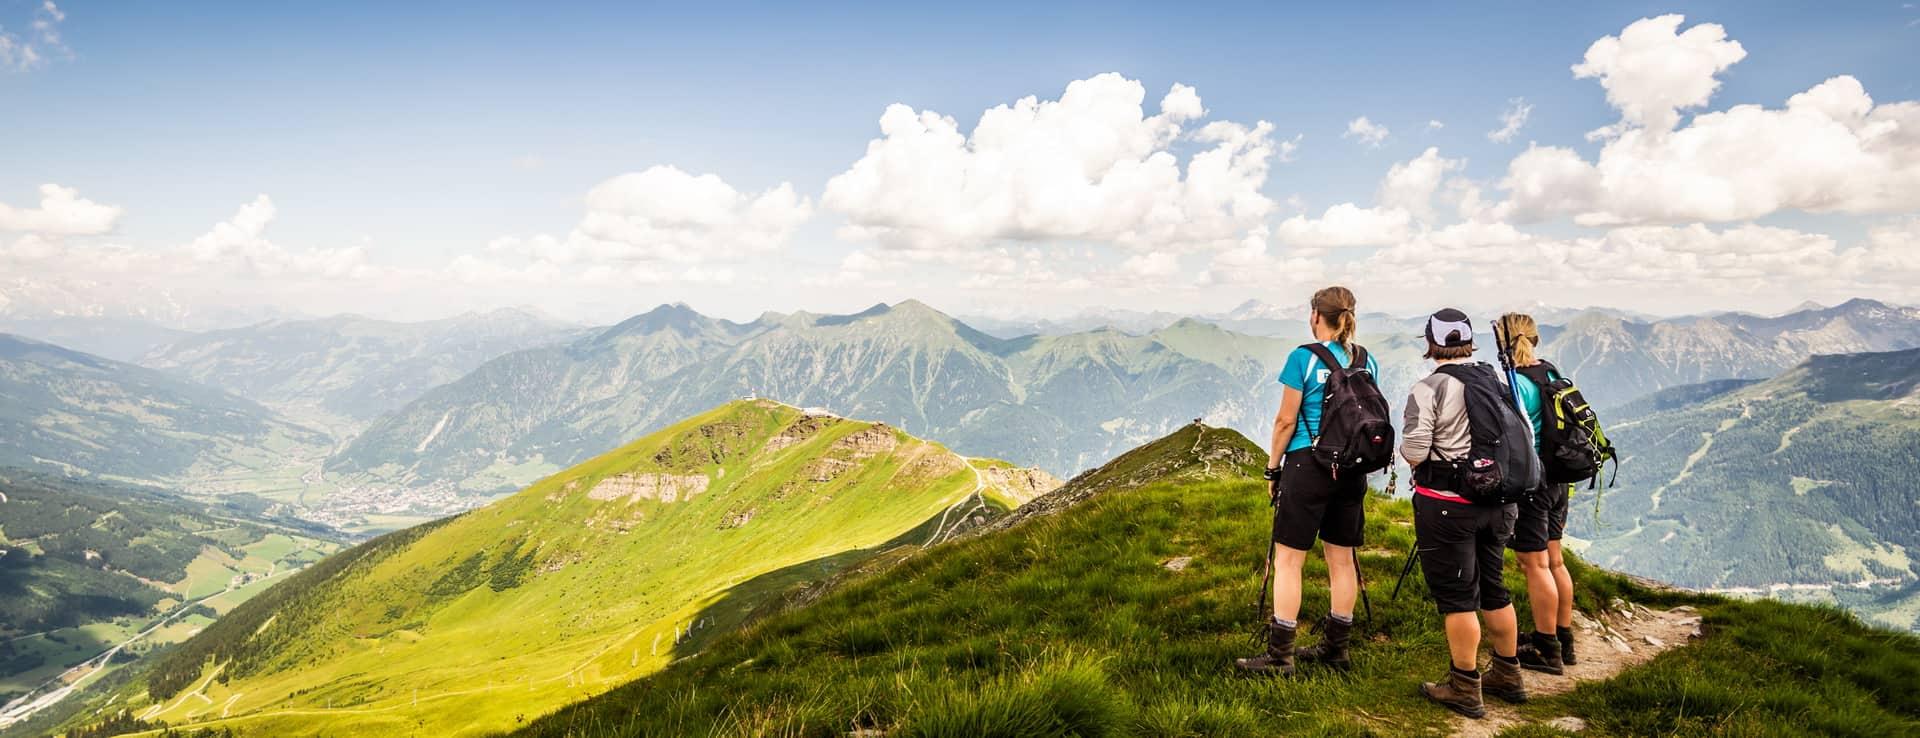 Vandring Bad Gastein- Semester i Österrike med Austria Travel